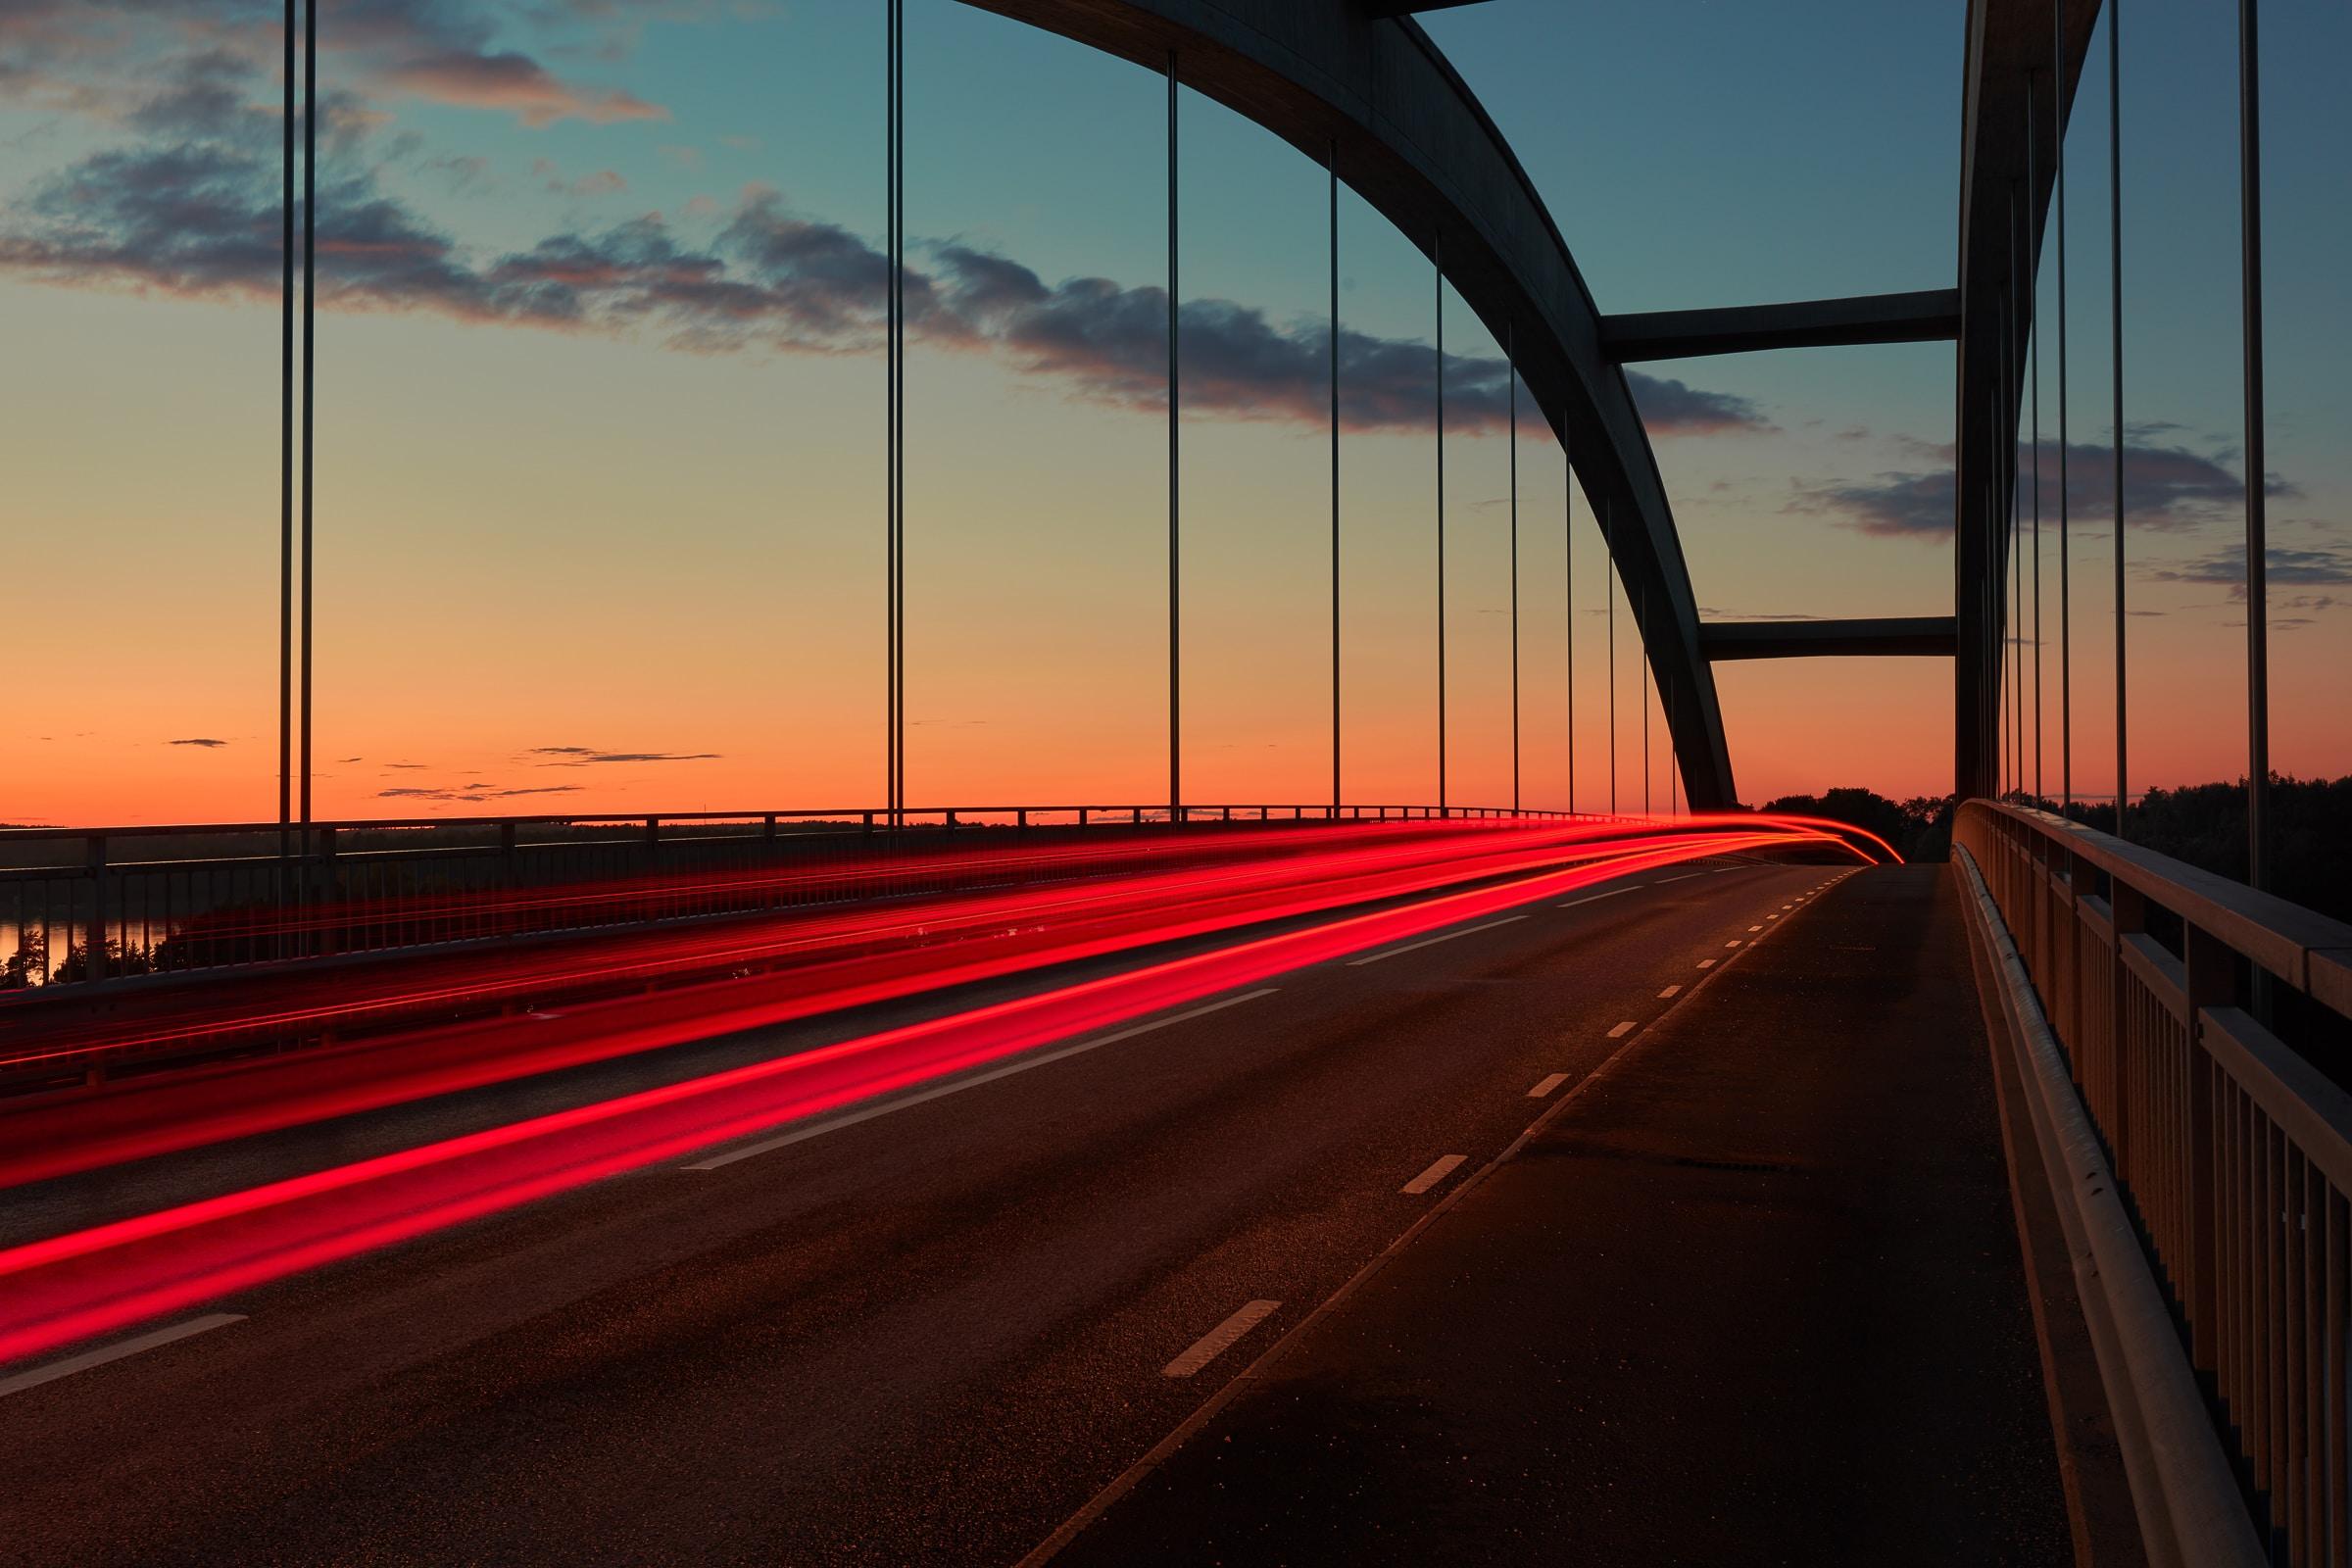 A blurry shot taken at sunrise, featuring a traffic light trail on a bridge in Djuröbron